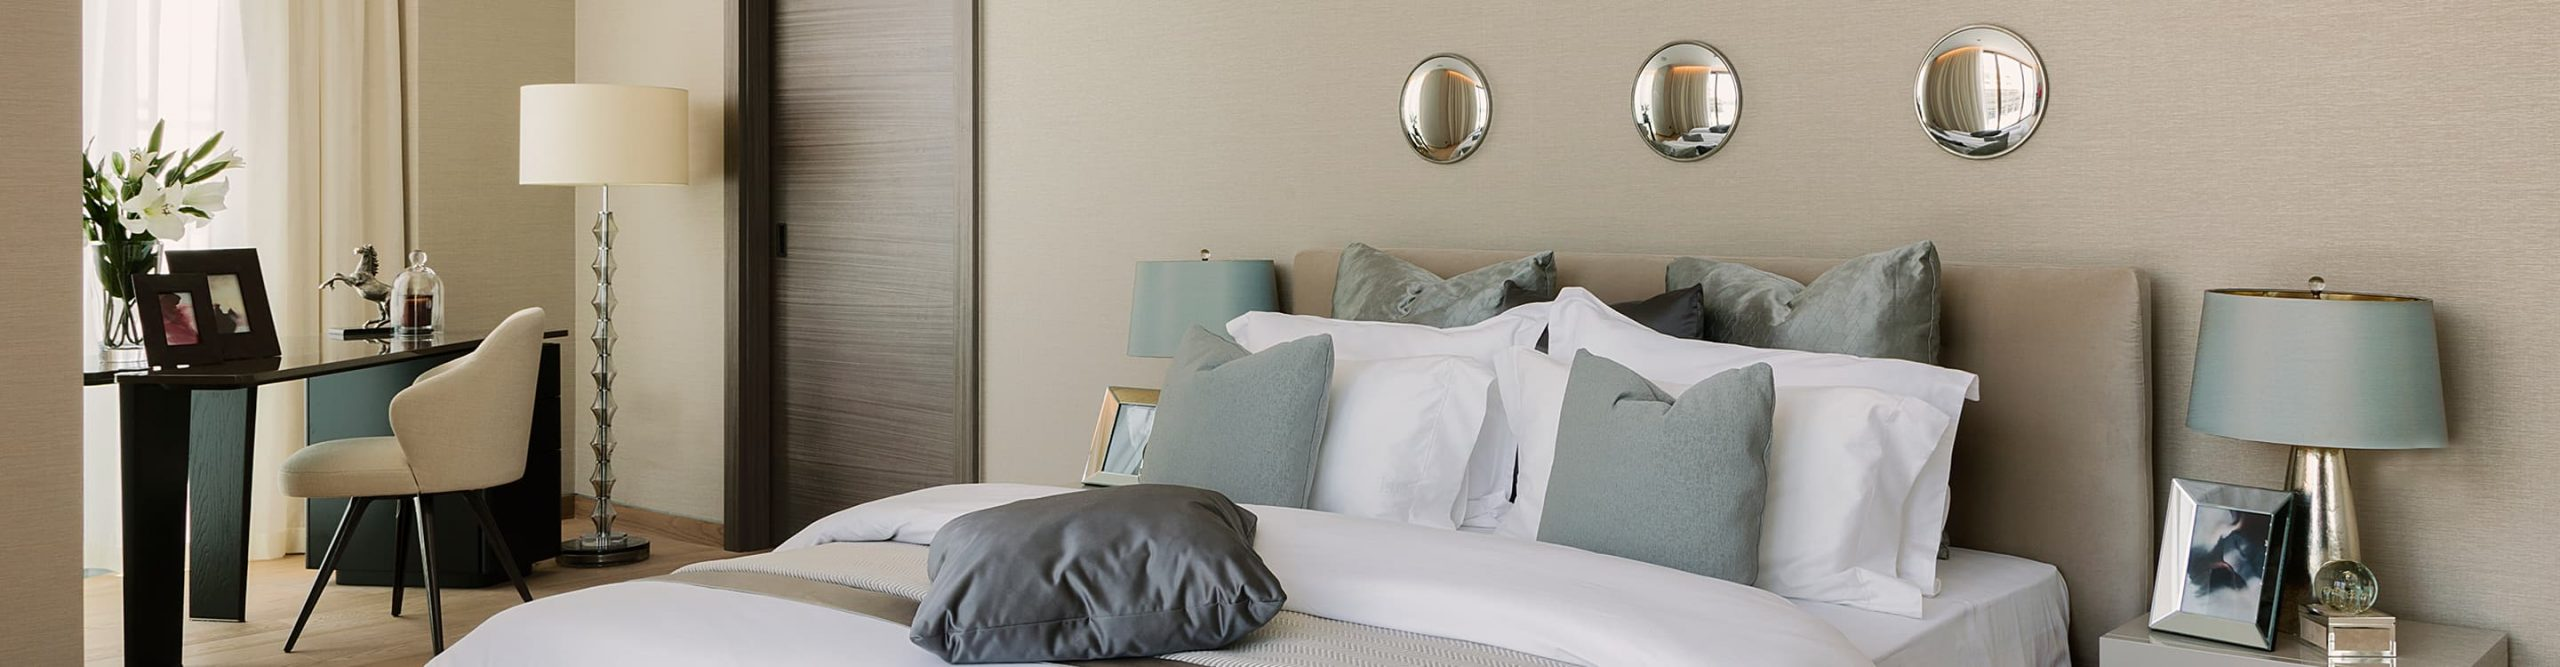 A luxury interior from W Residences Palm Jumeirah, Dubai